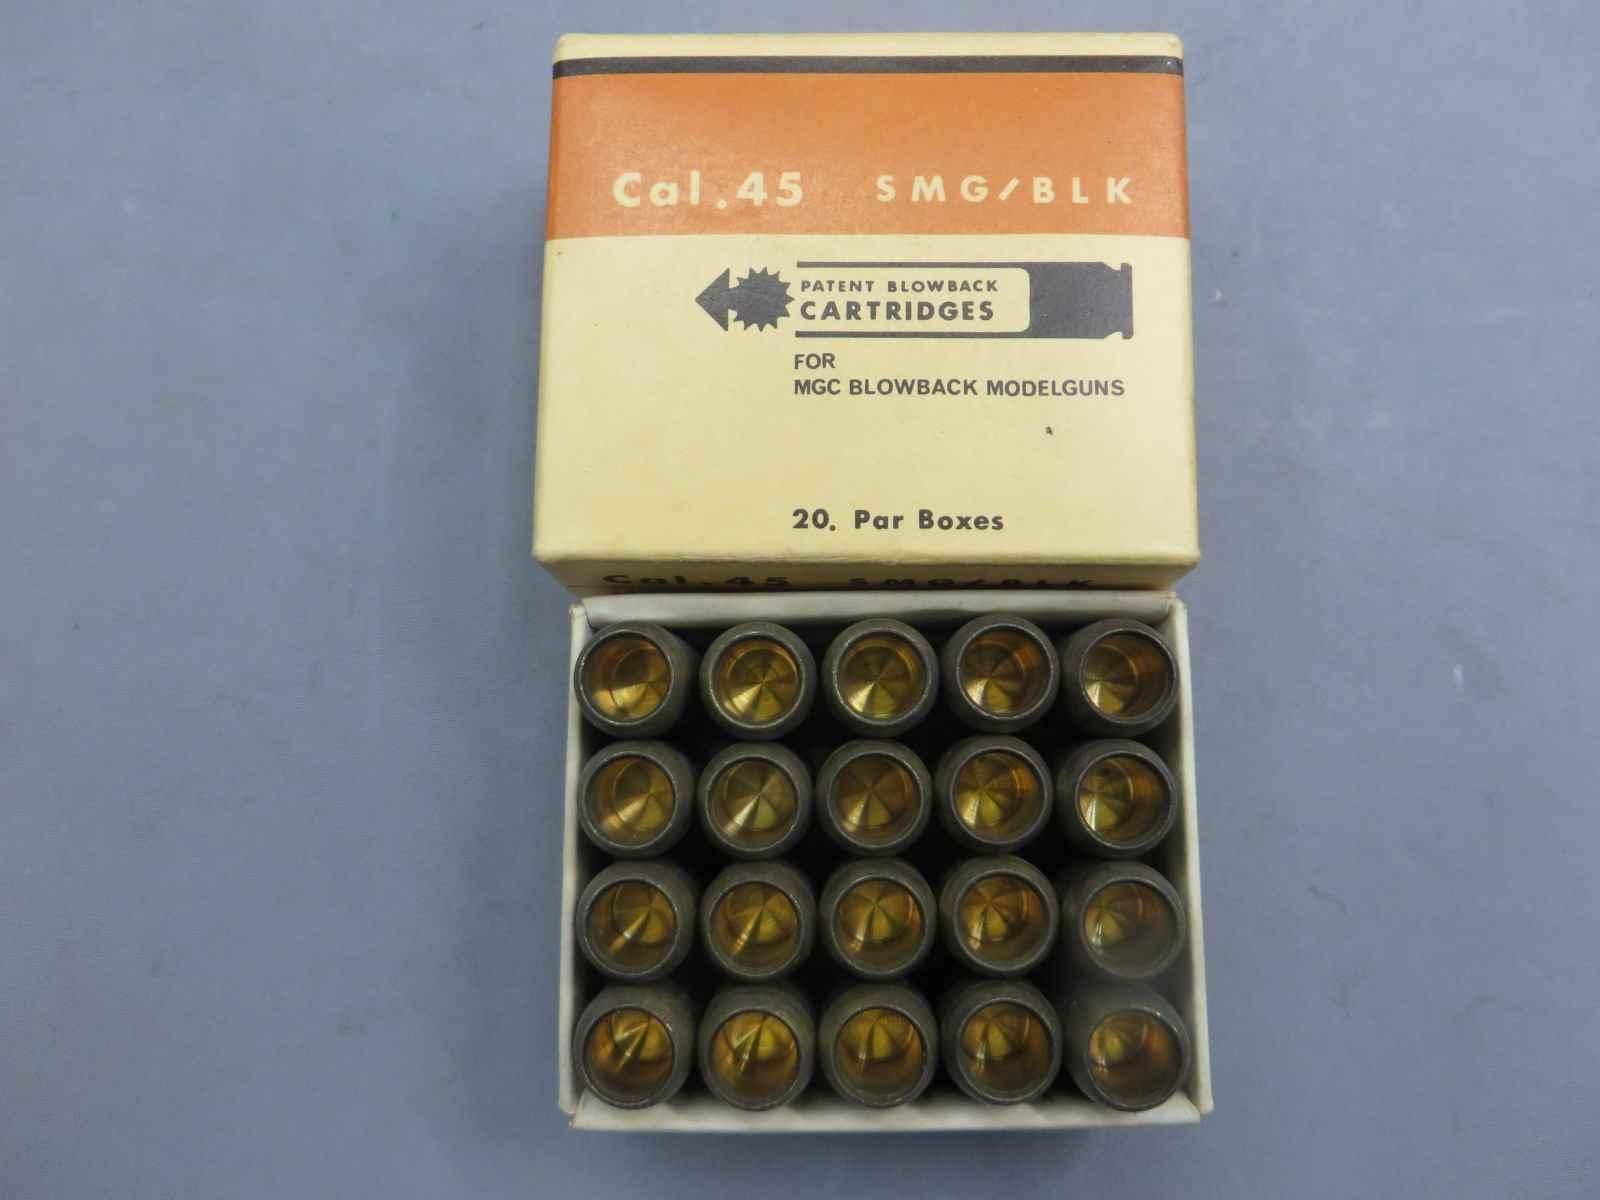 【MGC】Cal,45 SMG/BLK PATENTブローバック カートリッジ 20発